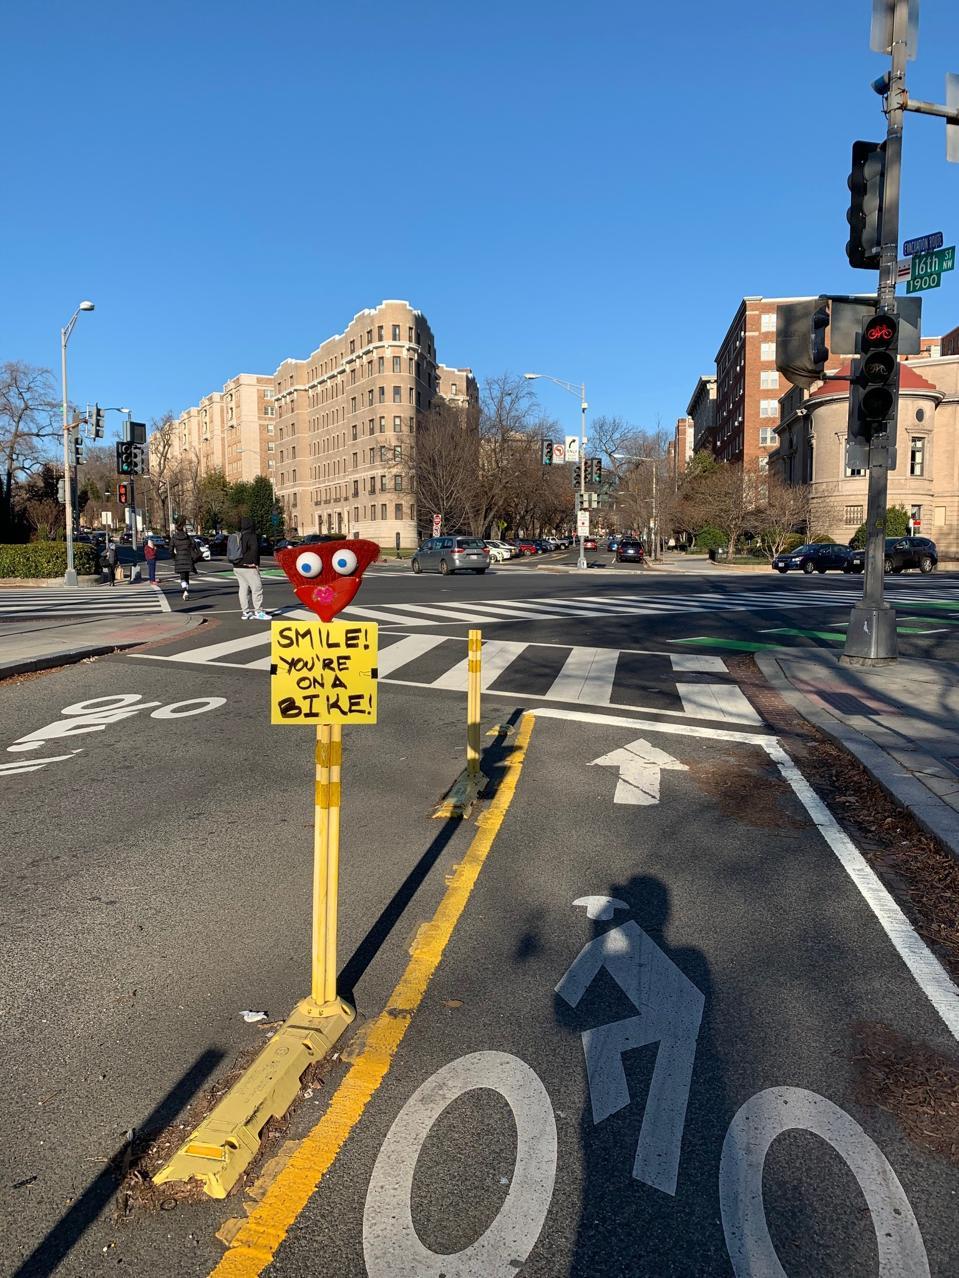 Bike lane in Washington D.C.